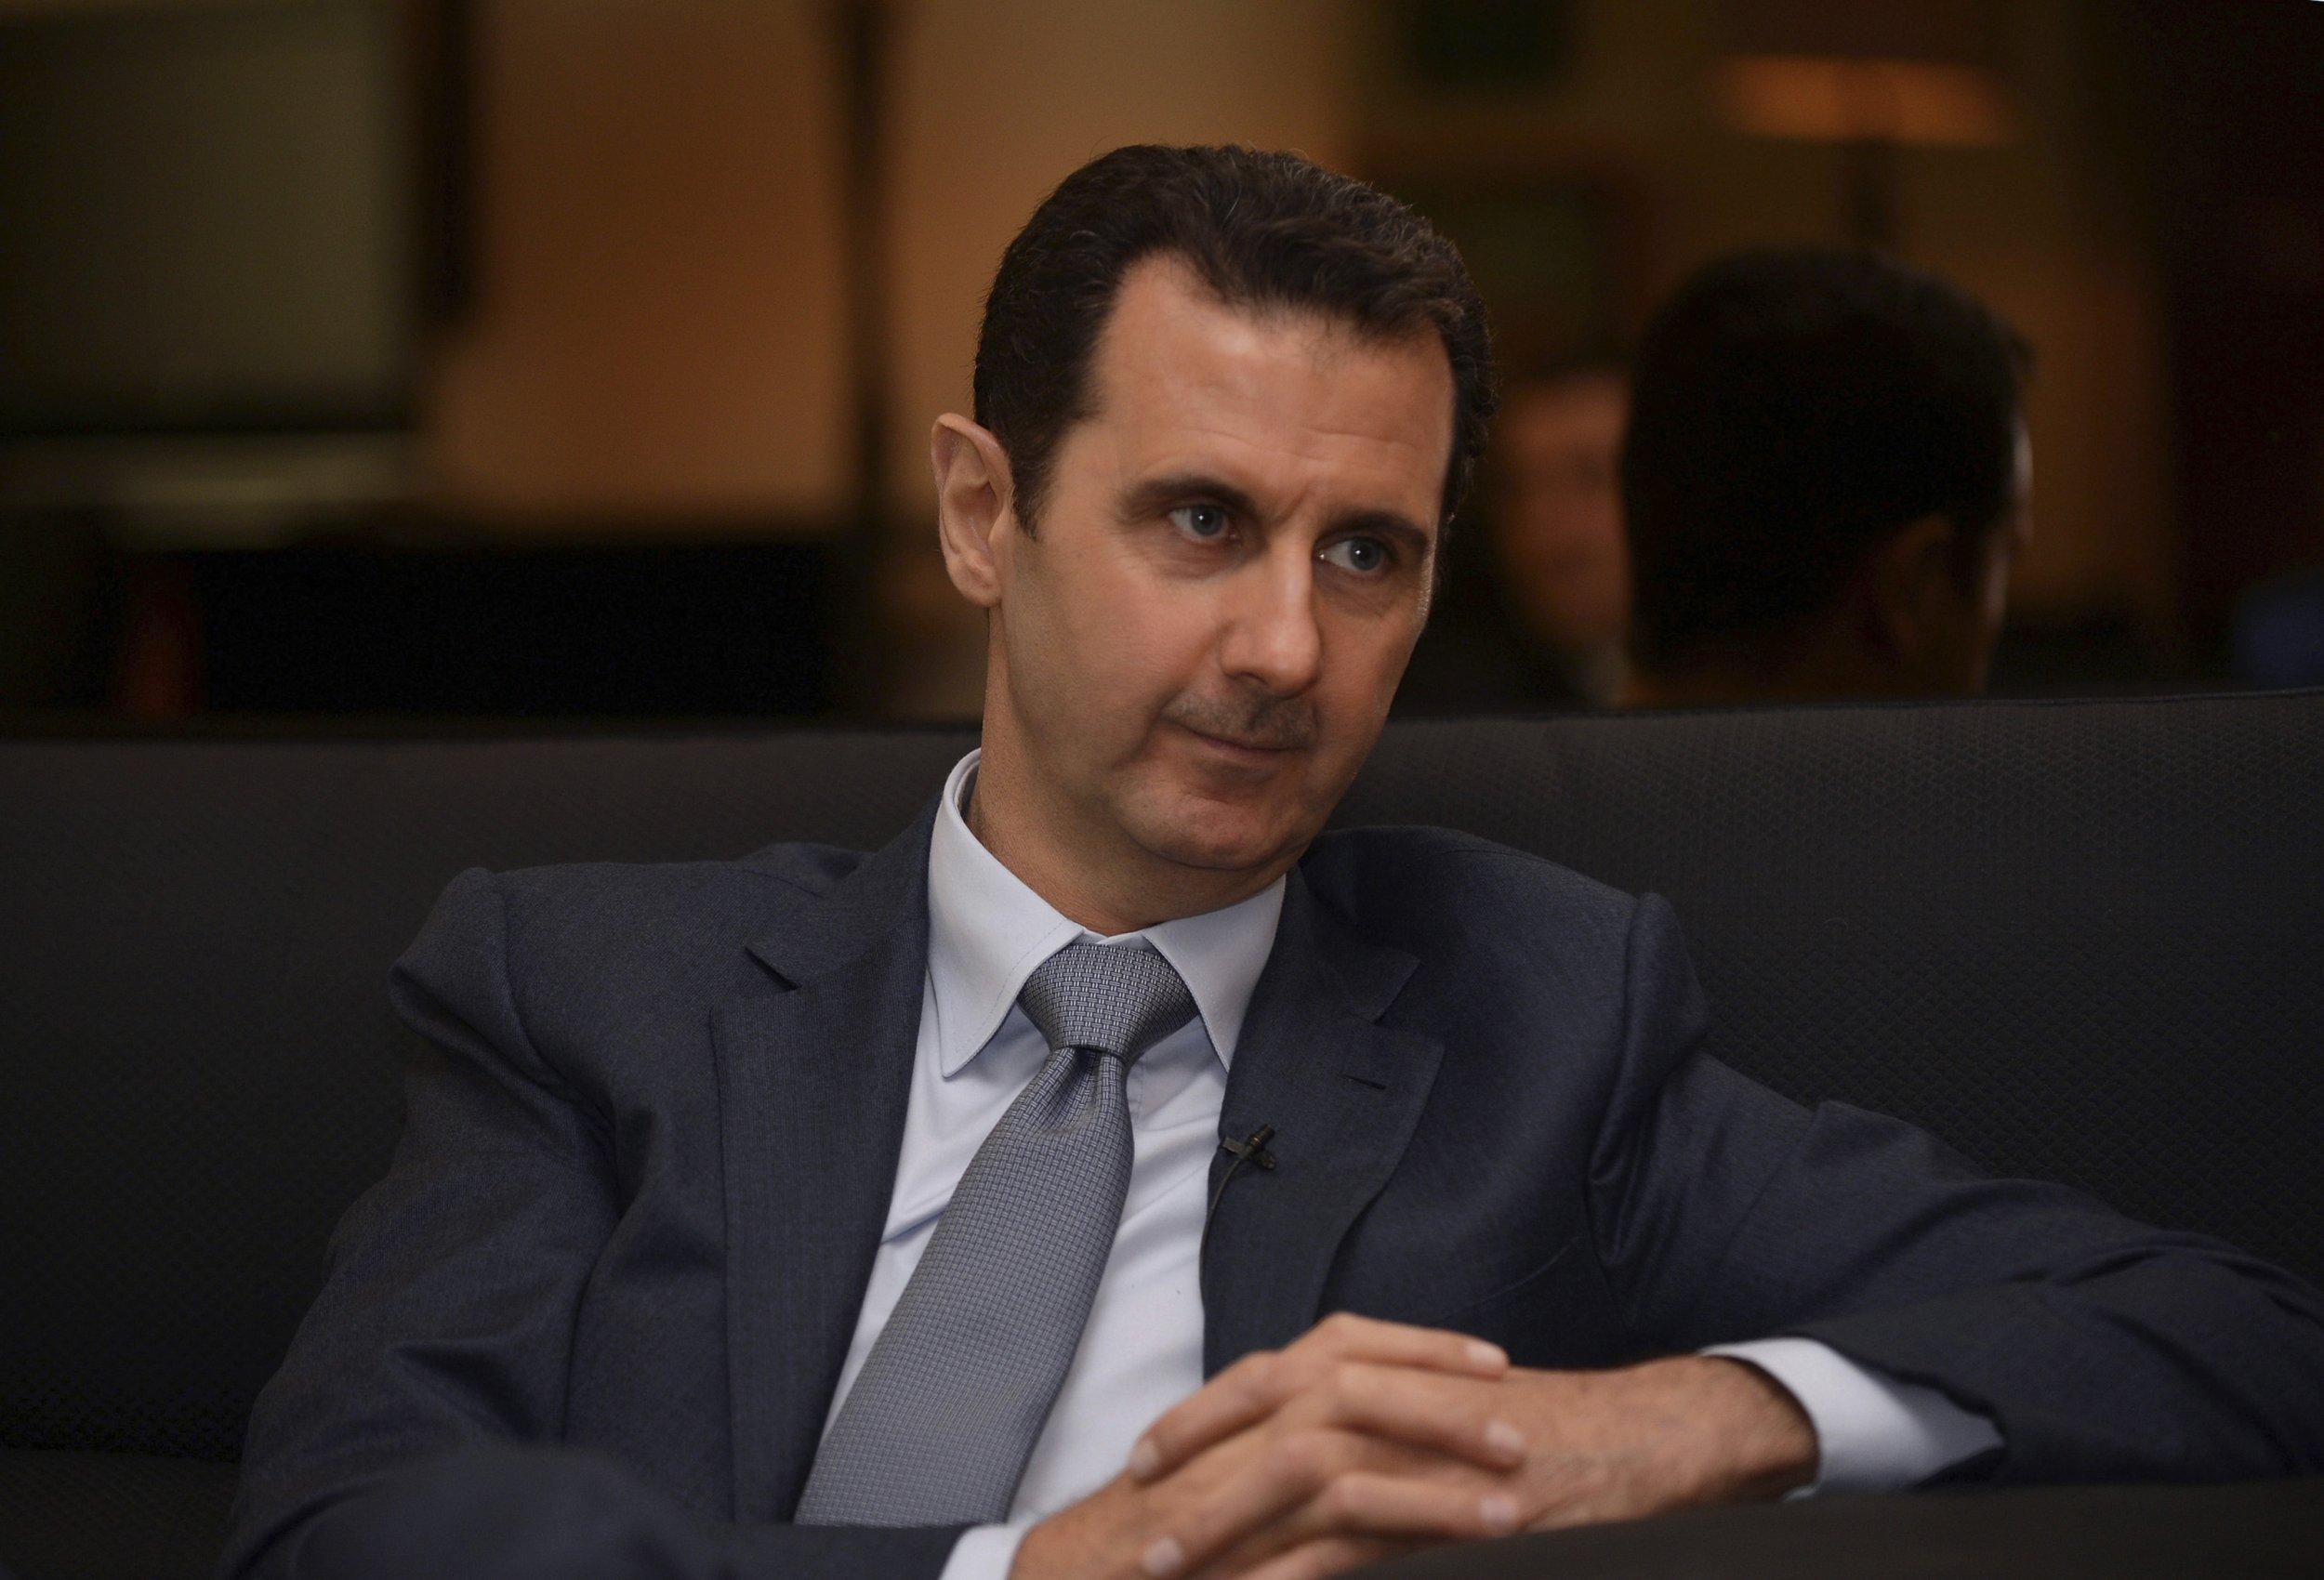 Guerra na Síria será longa e difícil – Bashar al-Assad